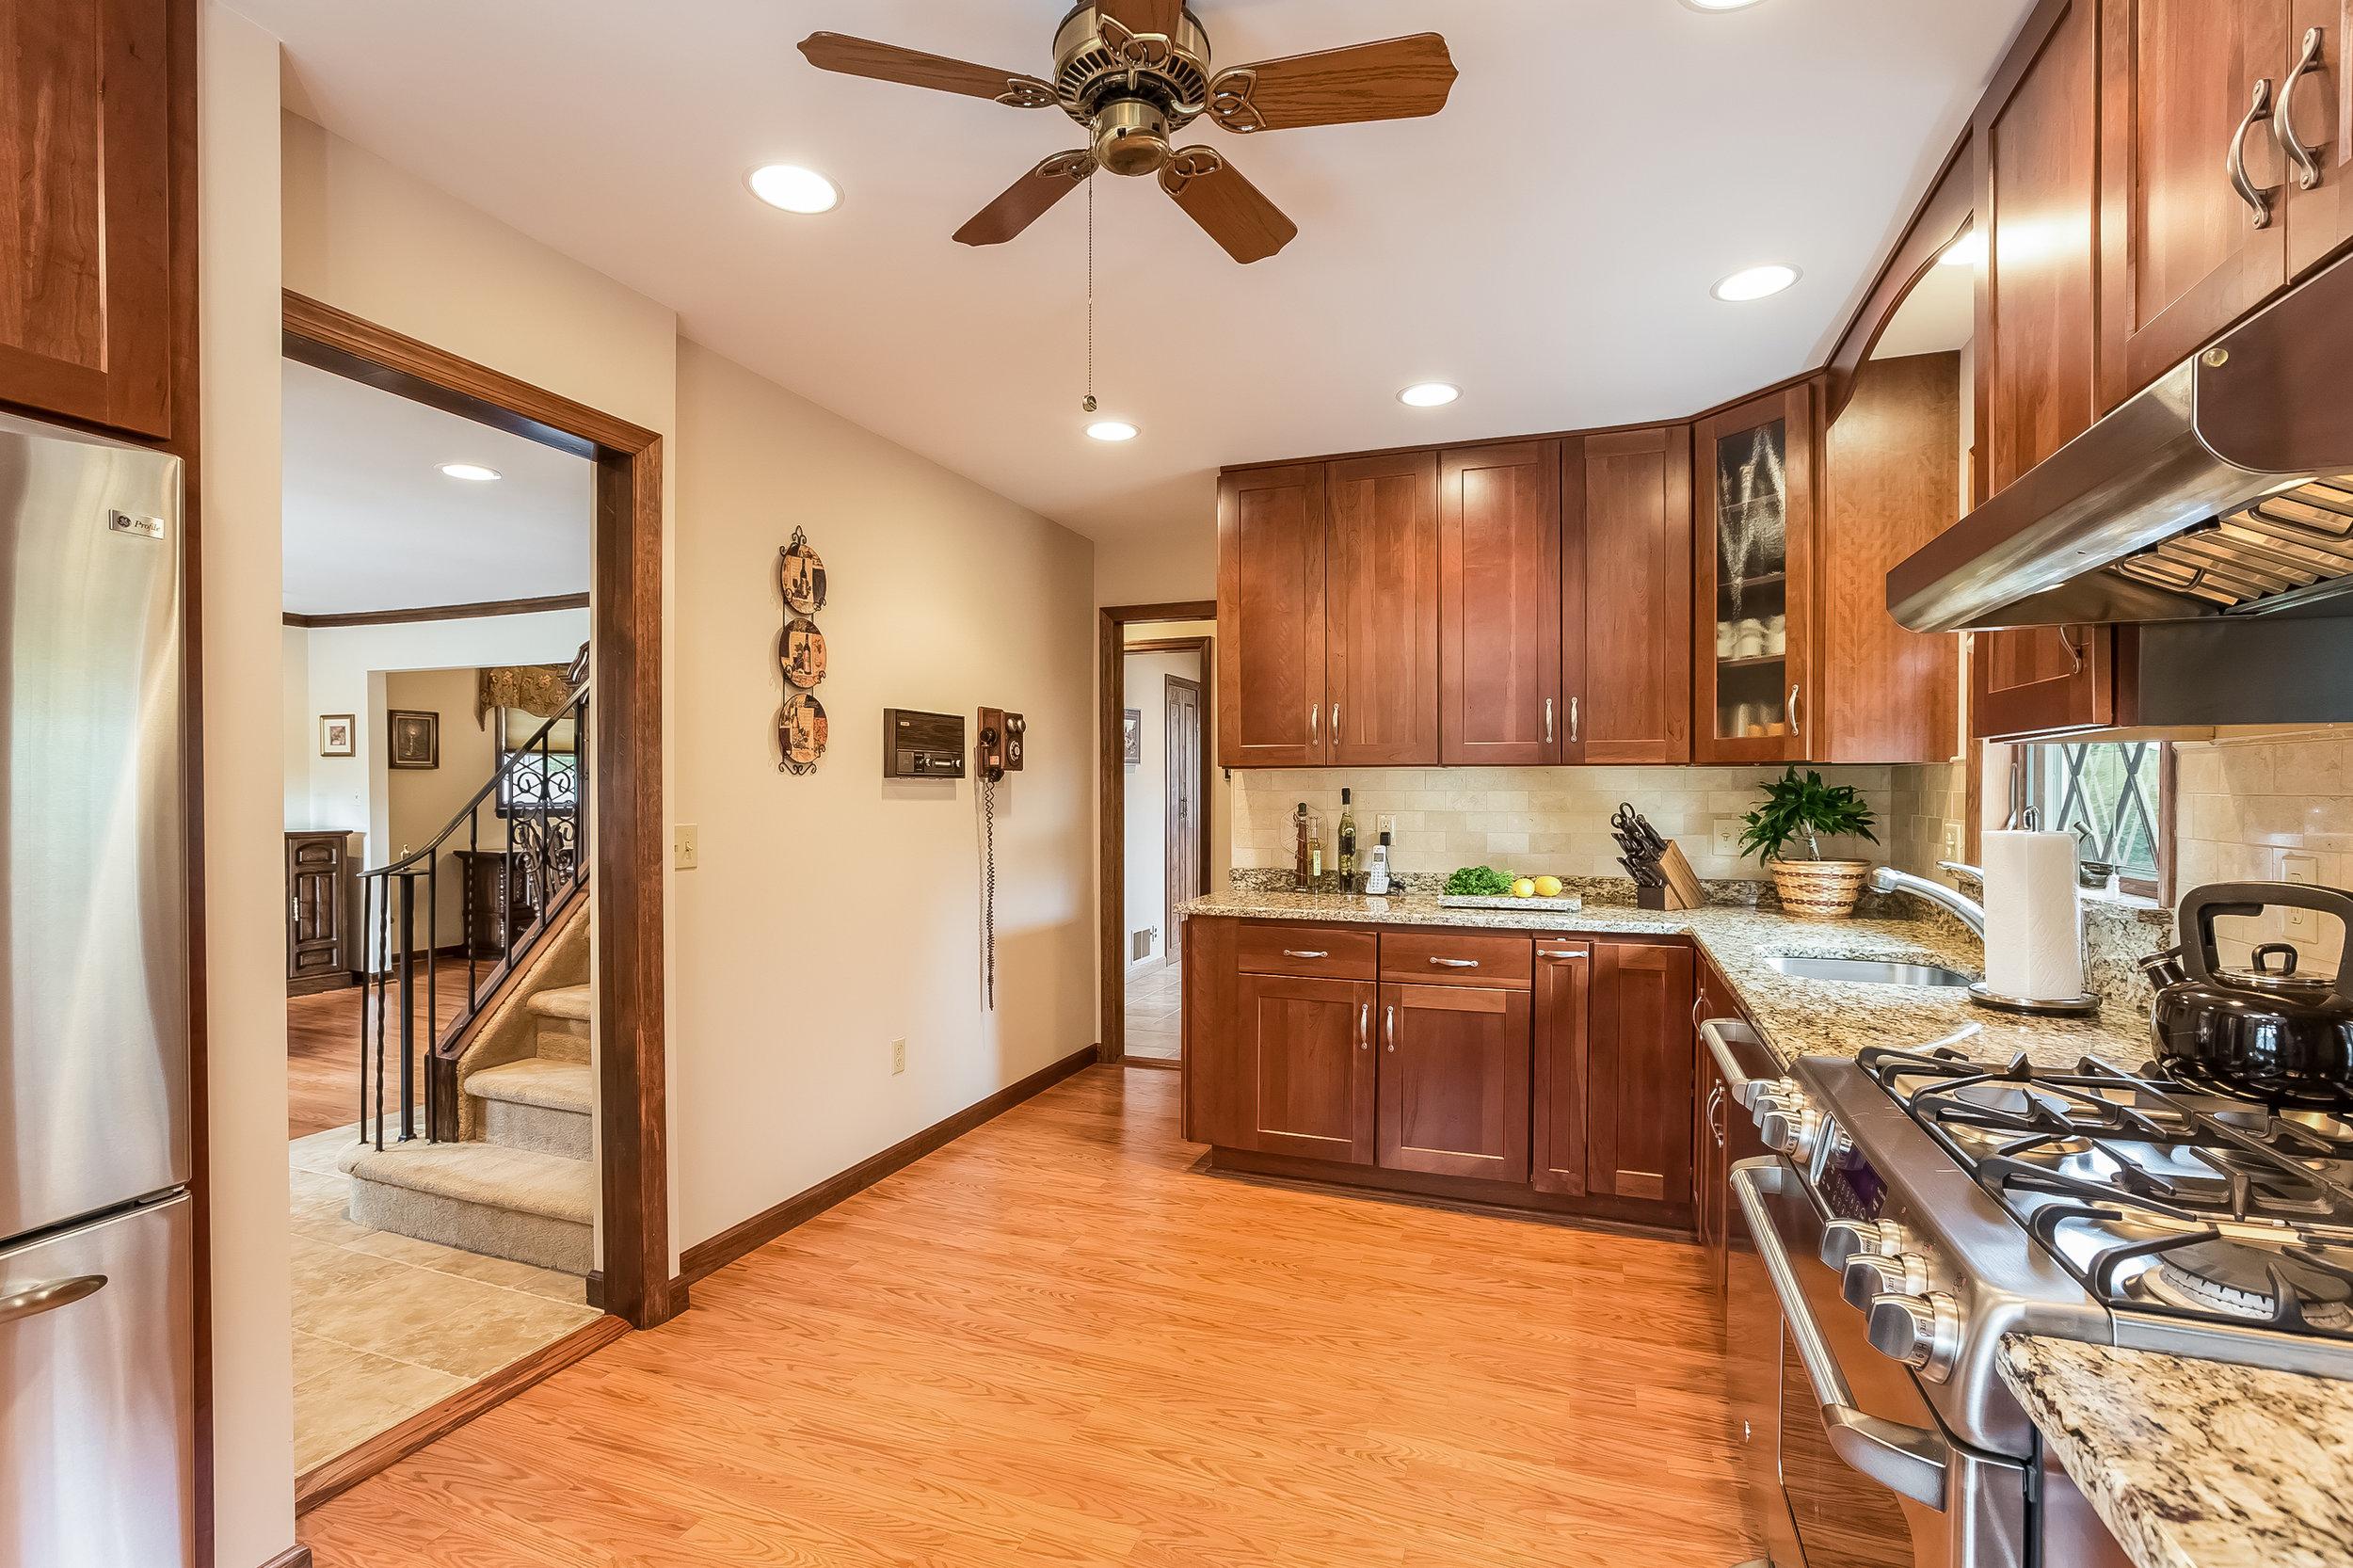 020-Kitchen-4932640-large.jpg